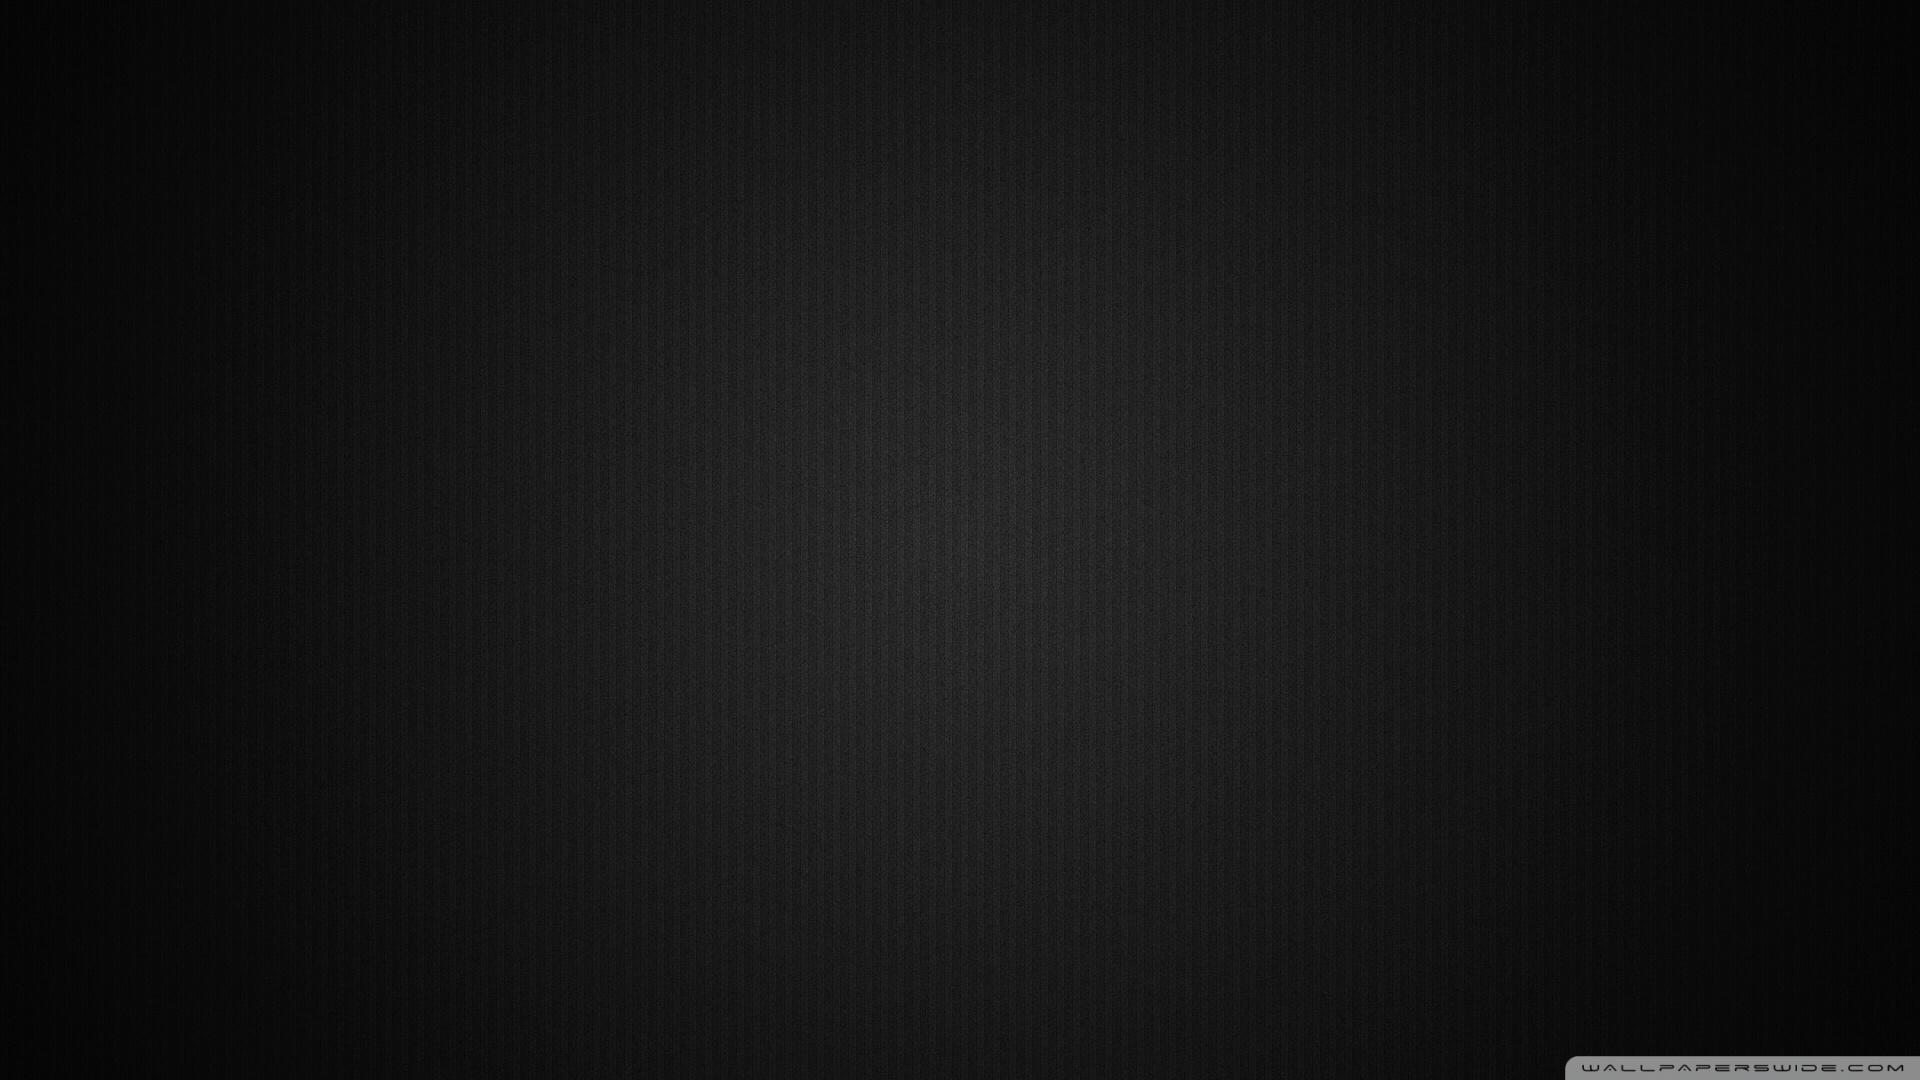 dark pattern ❤ 4k hd desktop wallpaper for 4k ultra hd tv • tablet